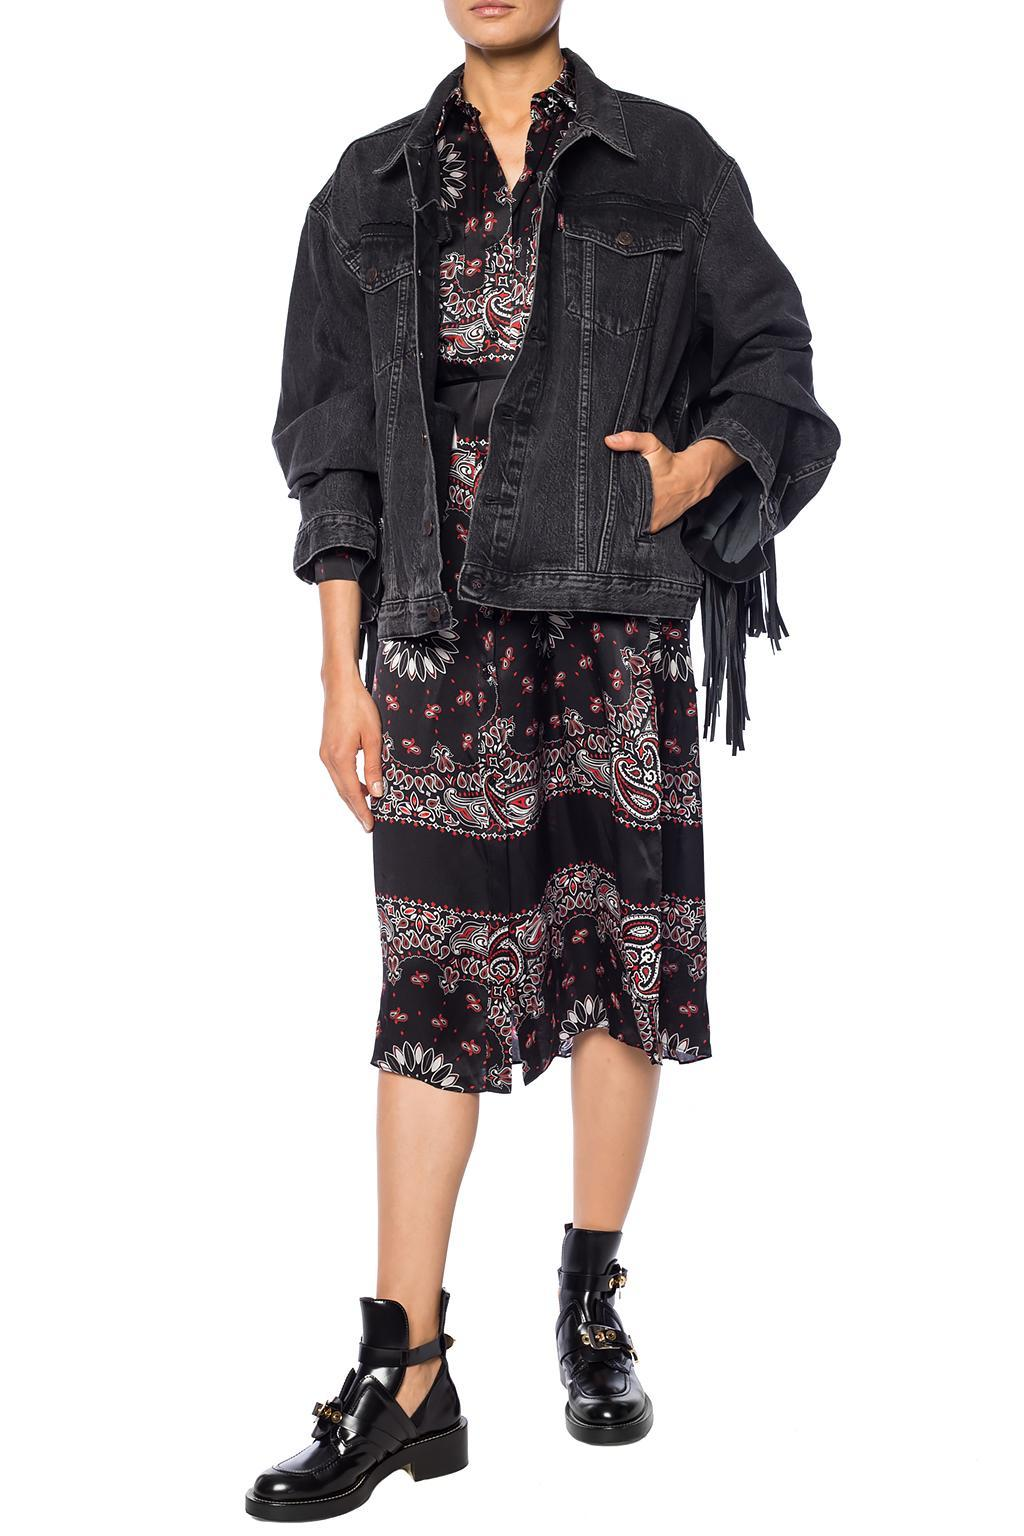 6958d9204e391 Lyst - Amiri Dress With A Collar in Black